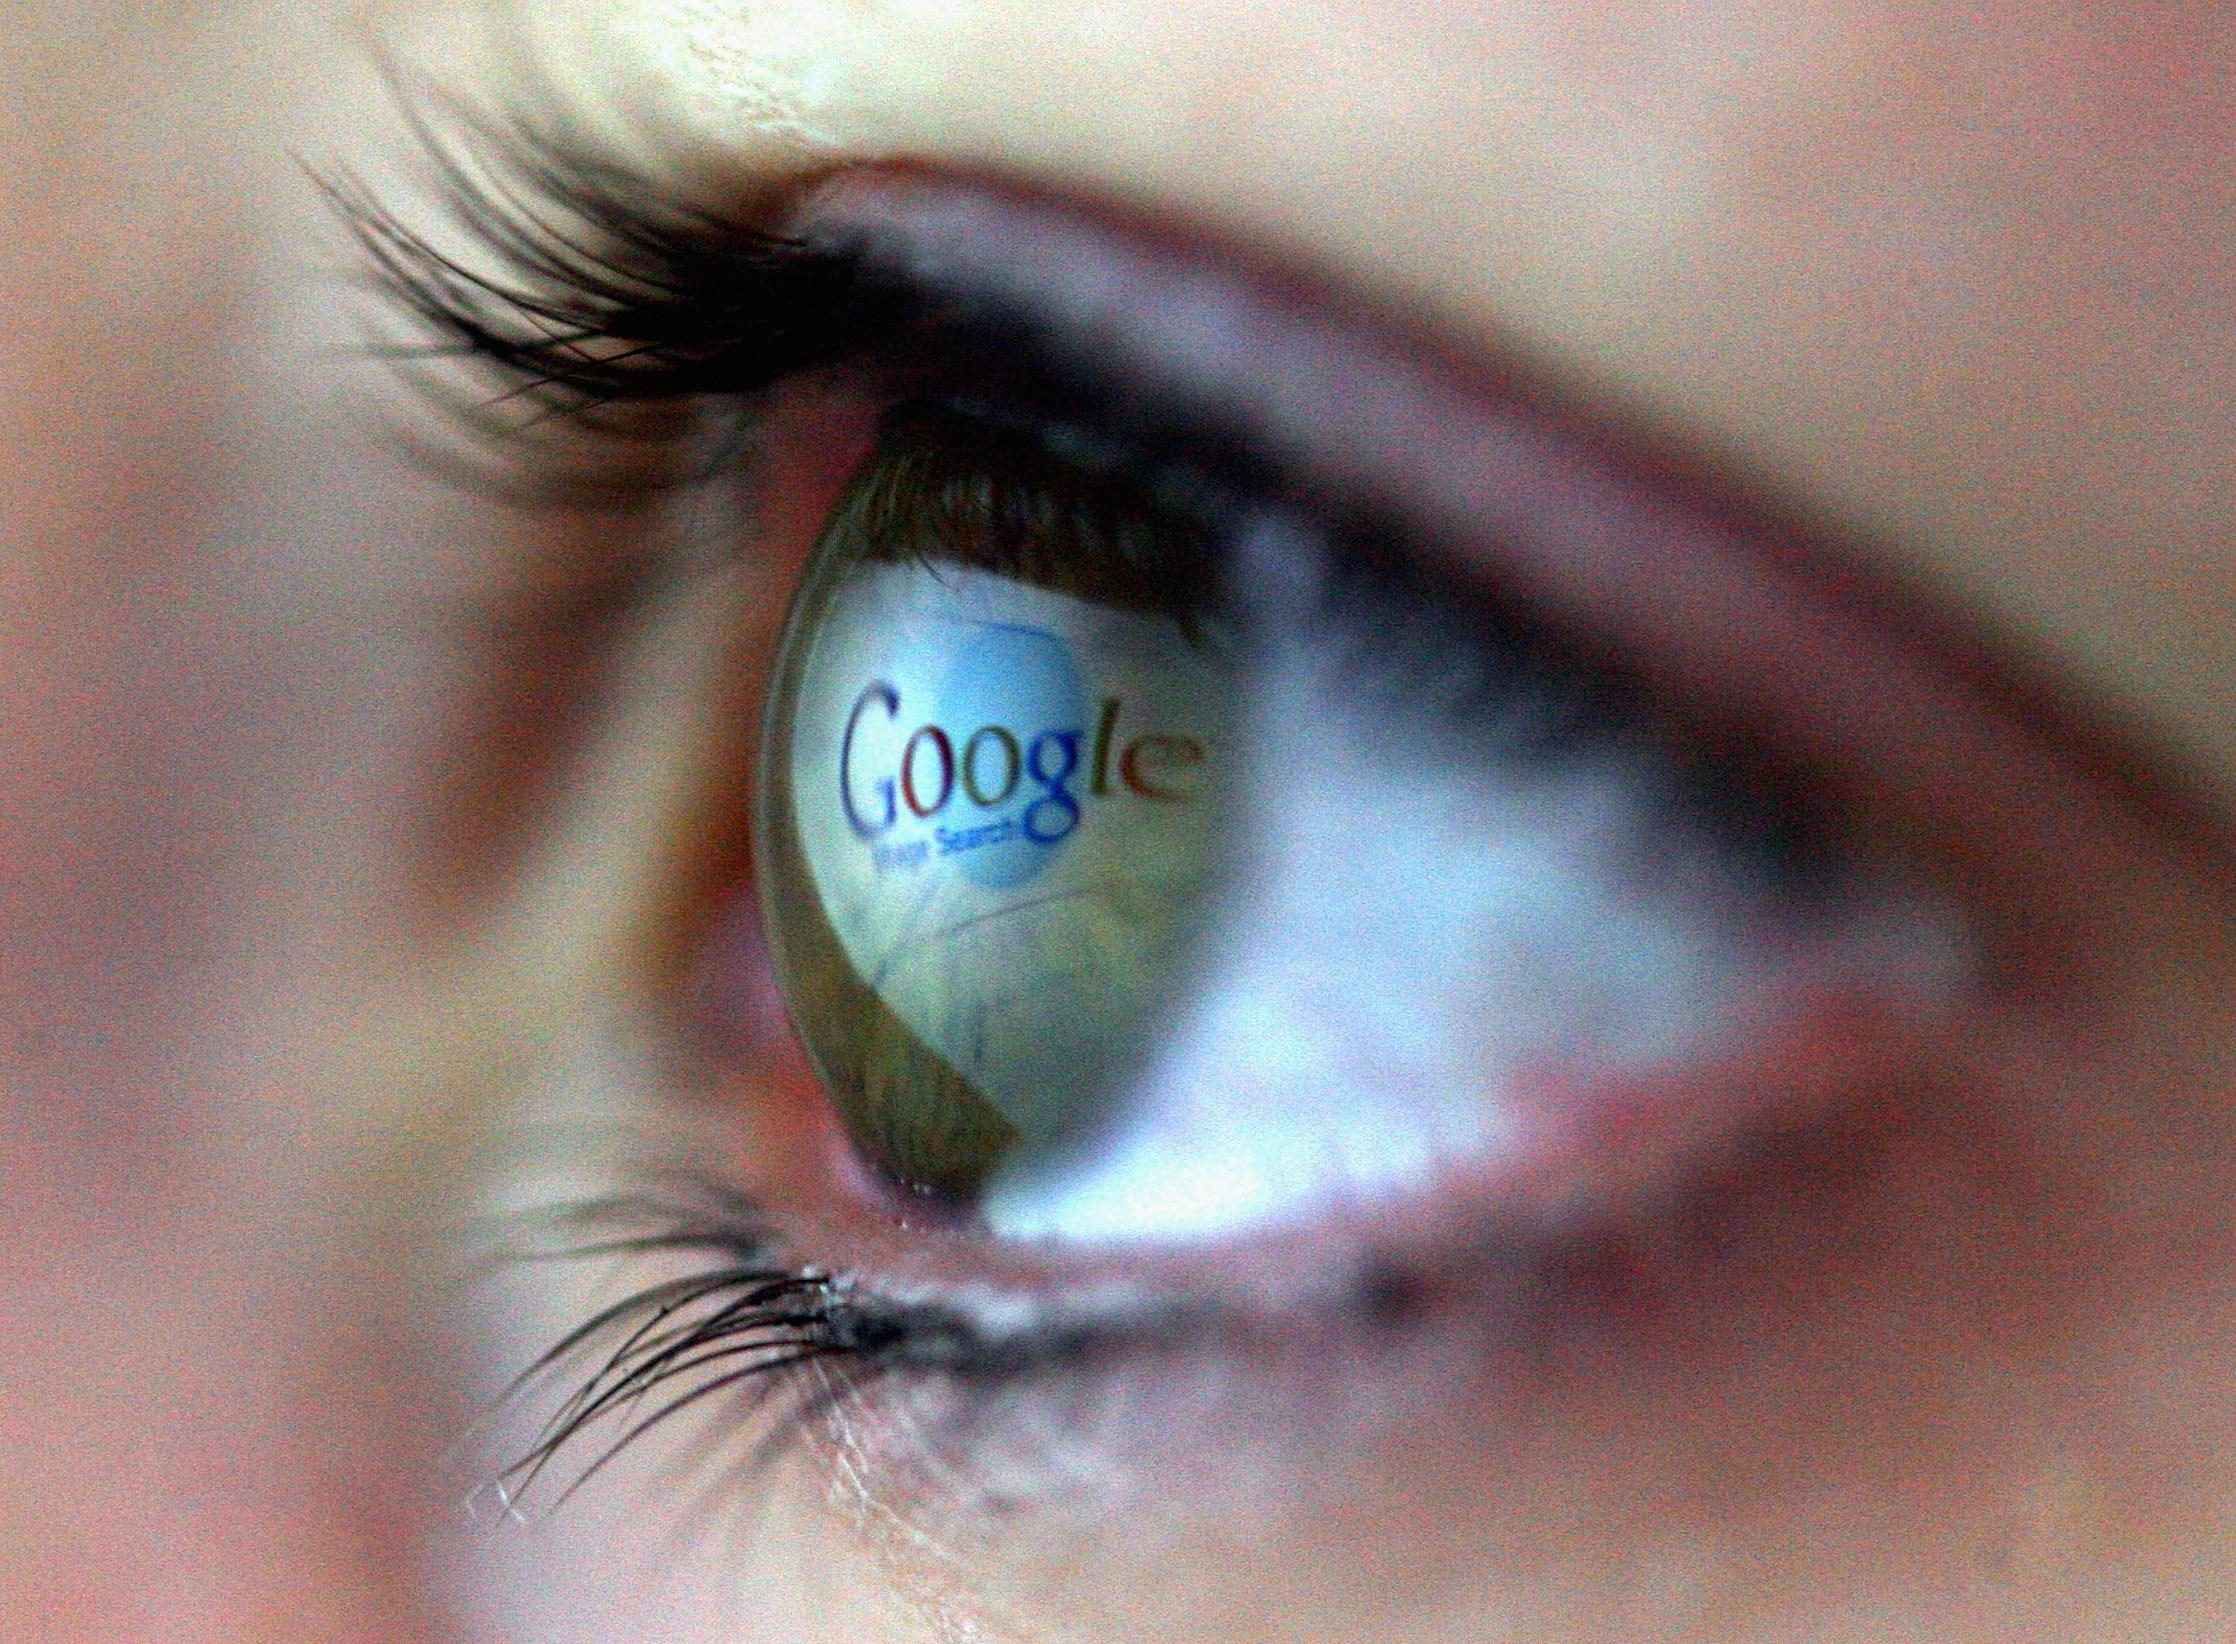 Google's parent company Alphabet is worth $1.3trillion